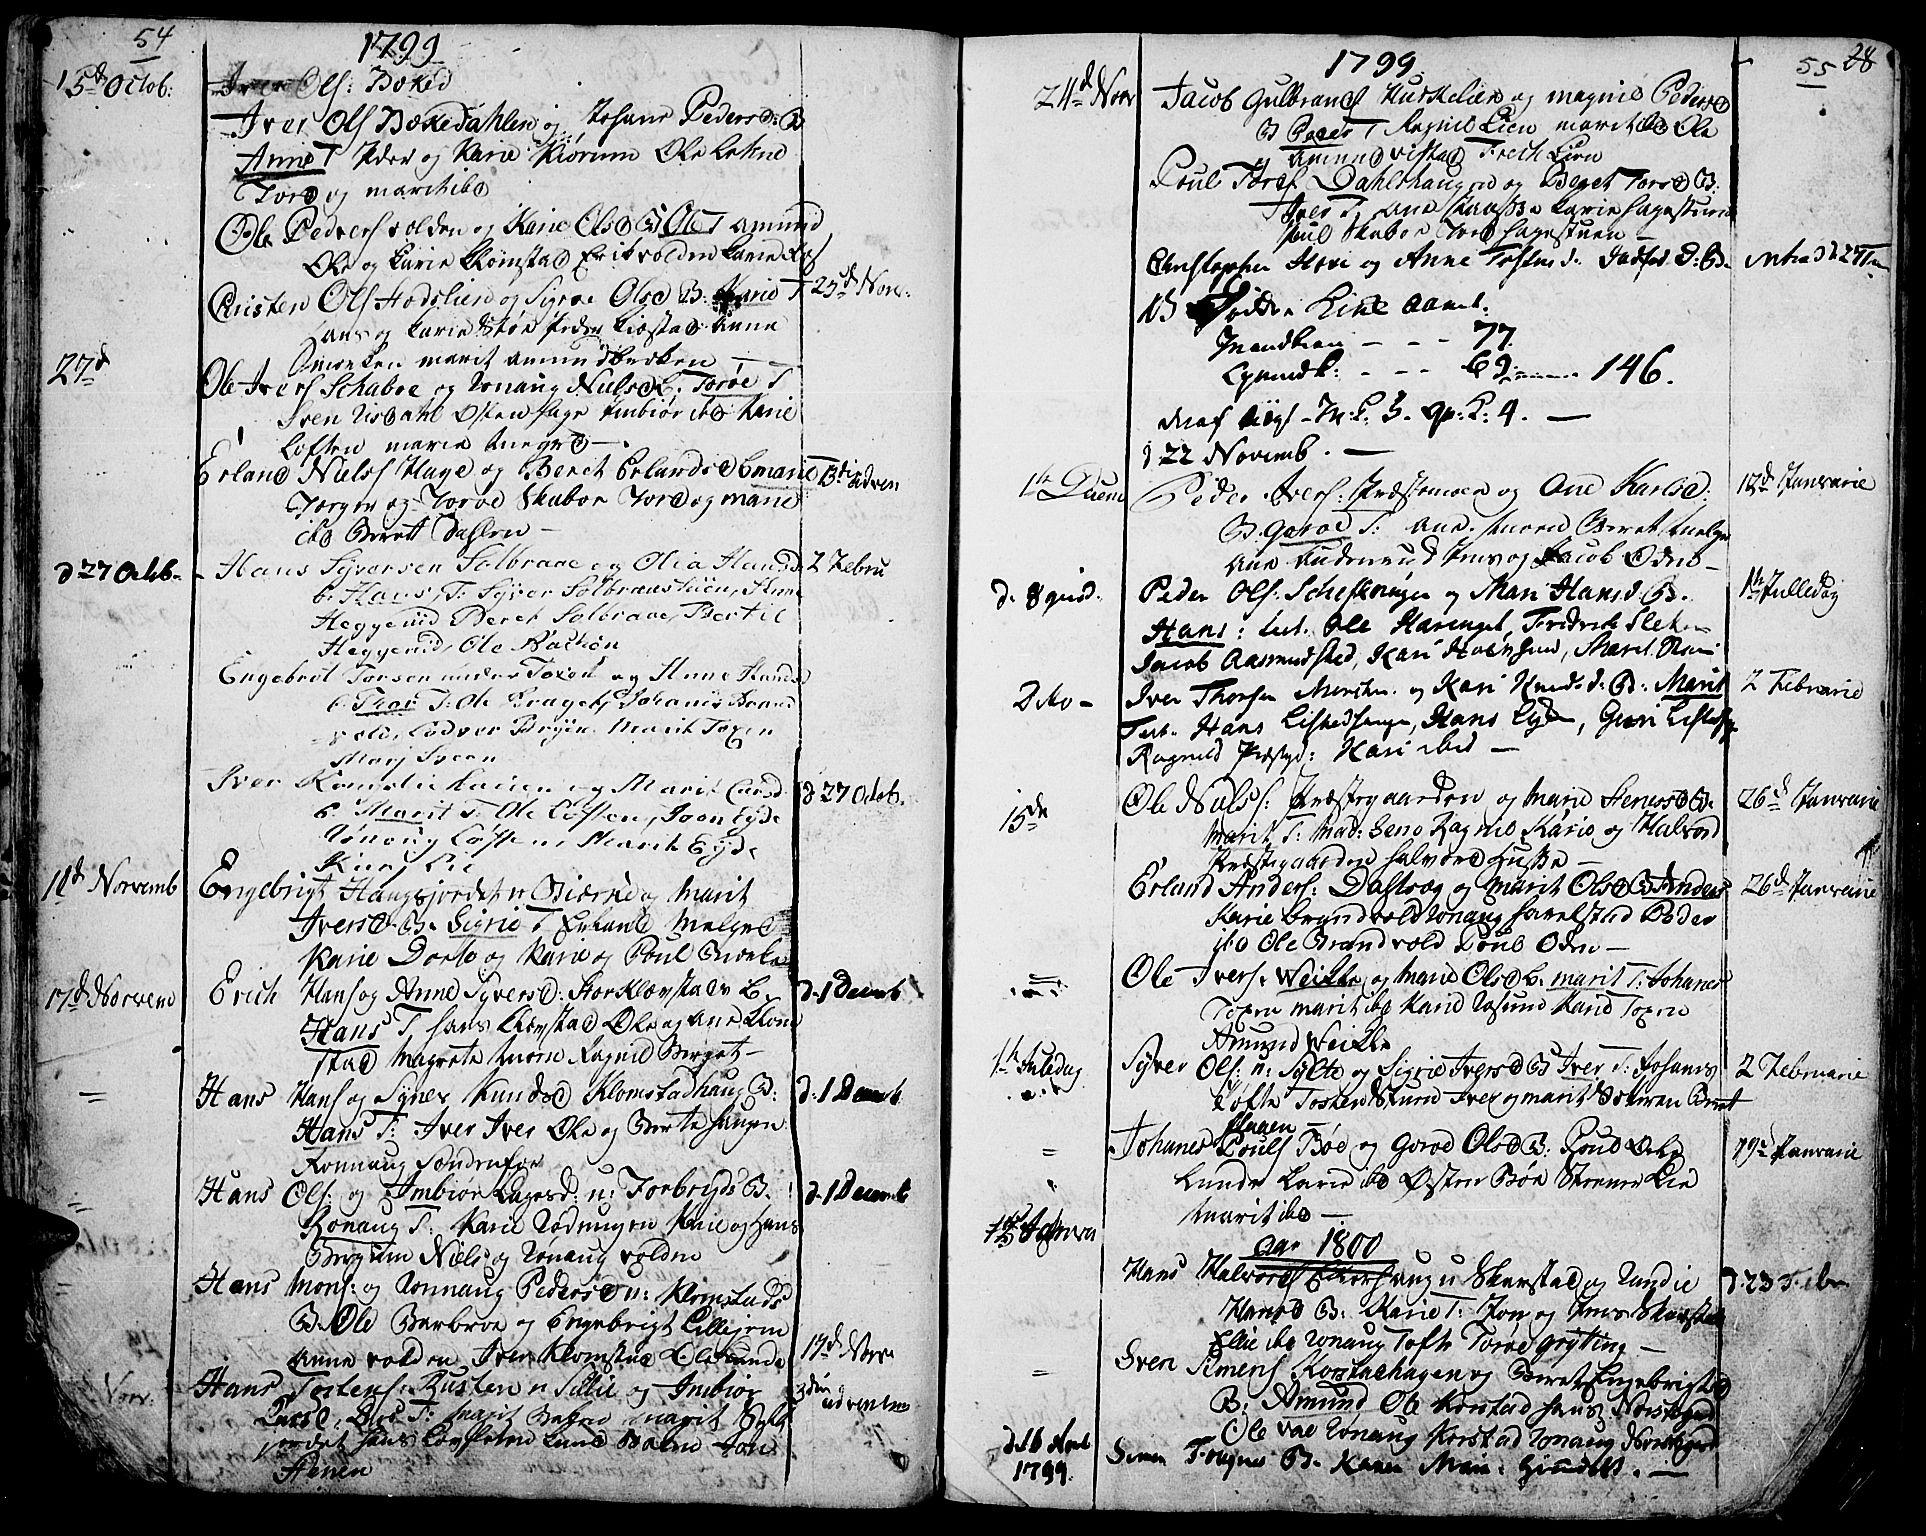 SAH, Fron prestekontor, H/Ha/Haa/L0001: Ministerialbok nr. 1, 1799-1816, s. 54-55